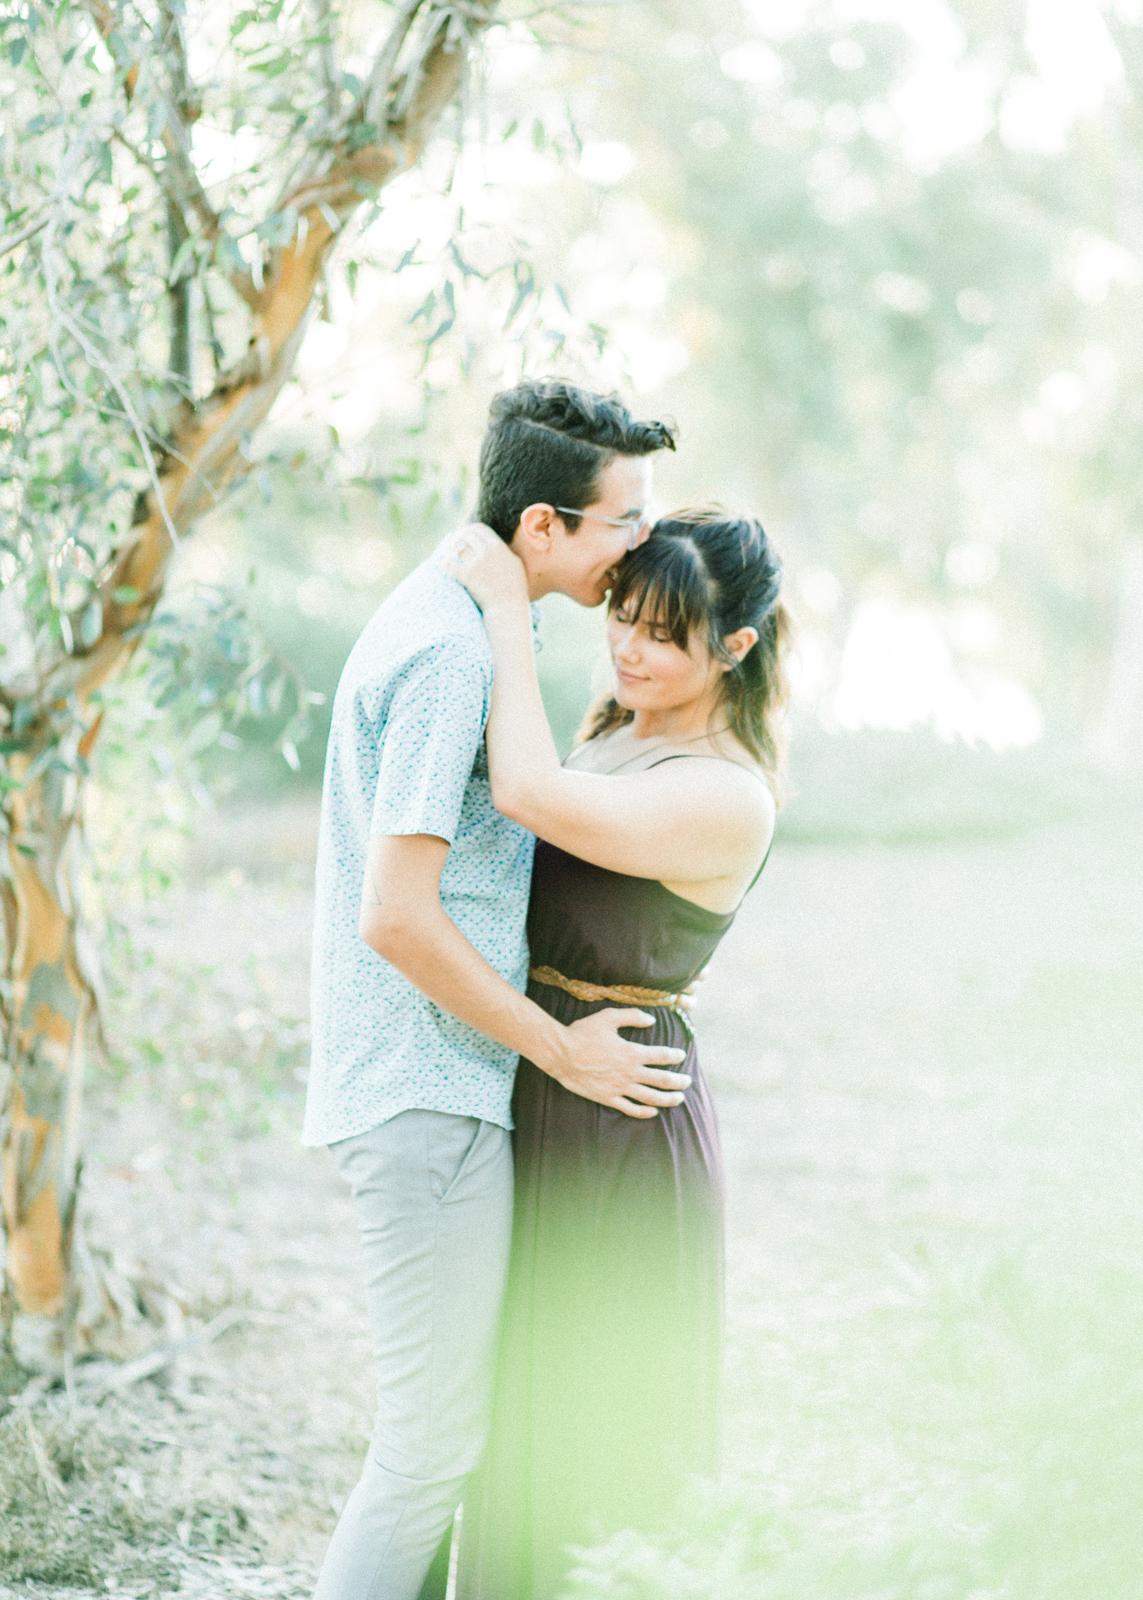 boise-idaho-elopement-engagement-photographer-7694.jpg